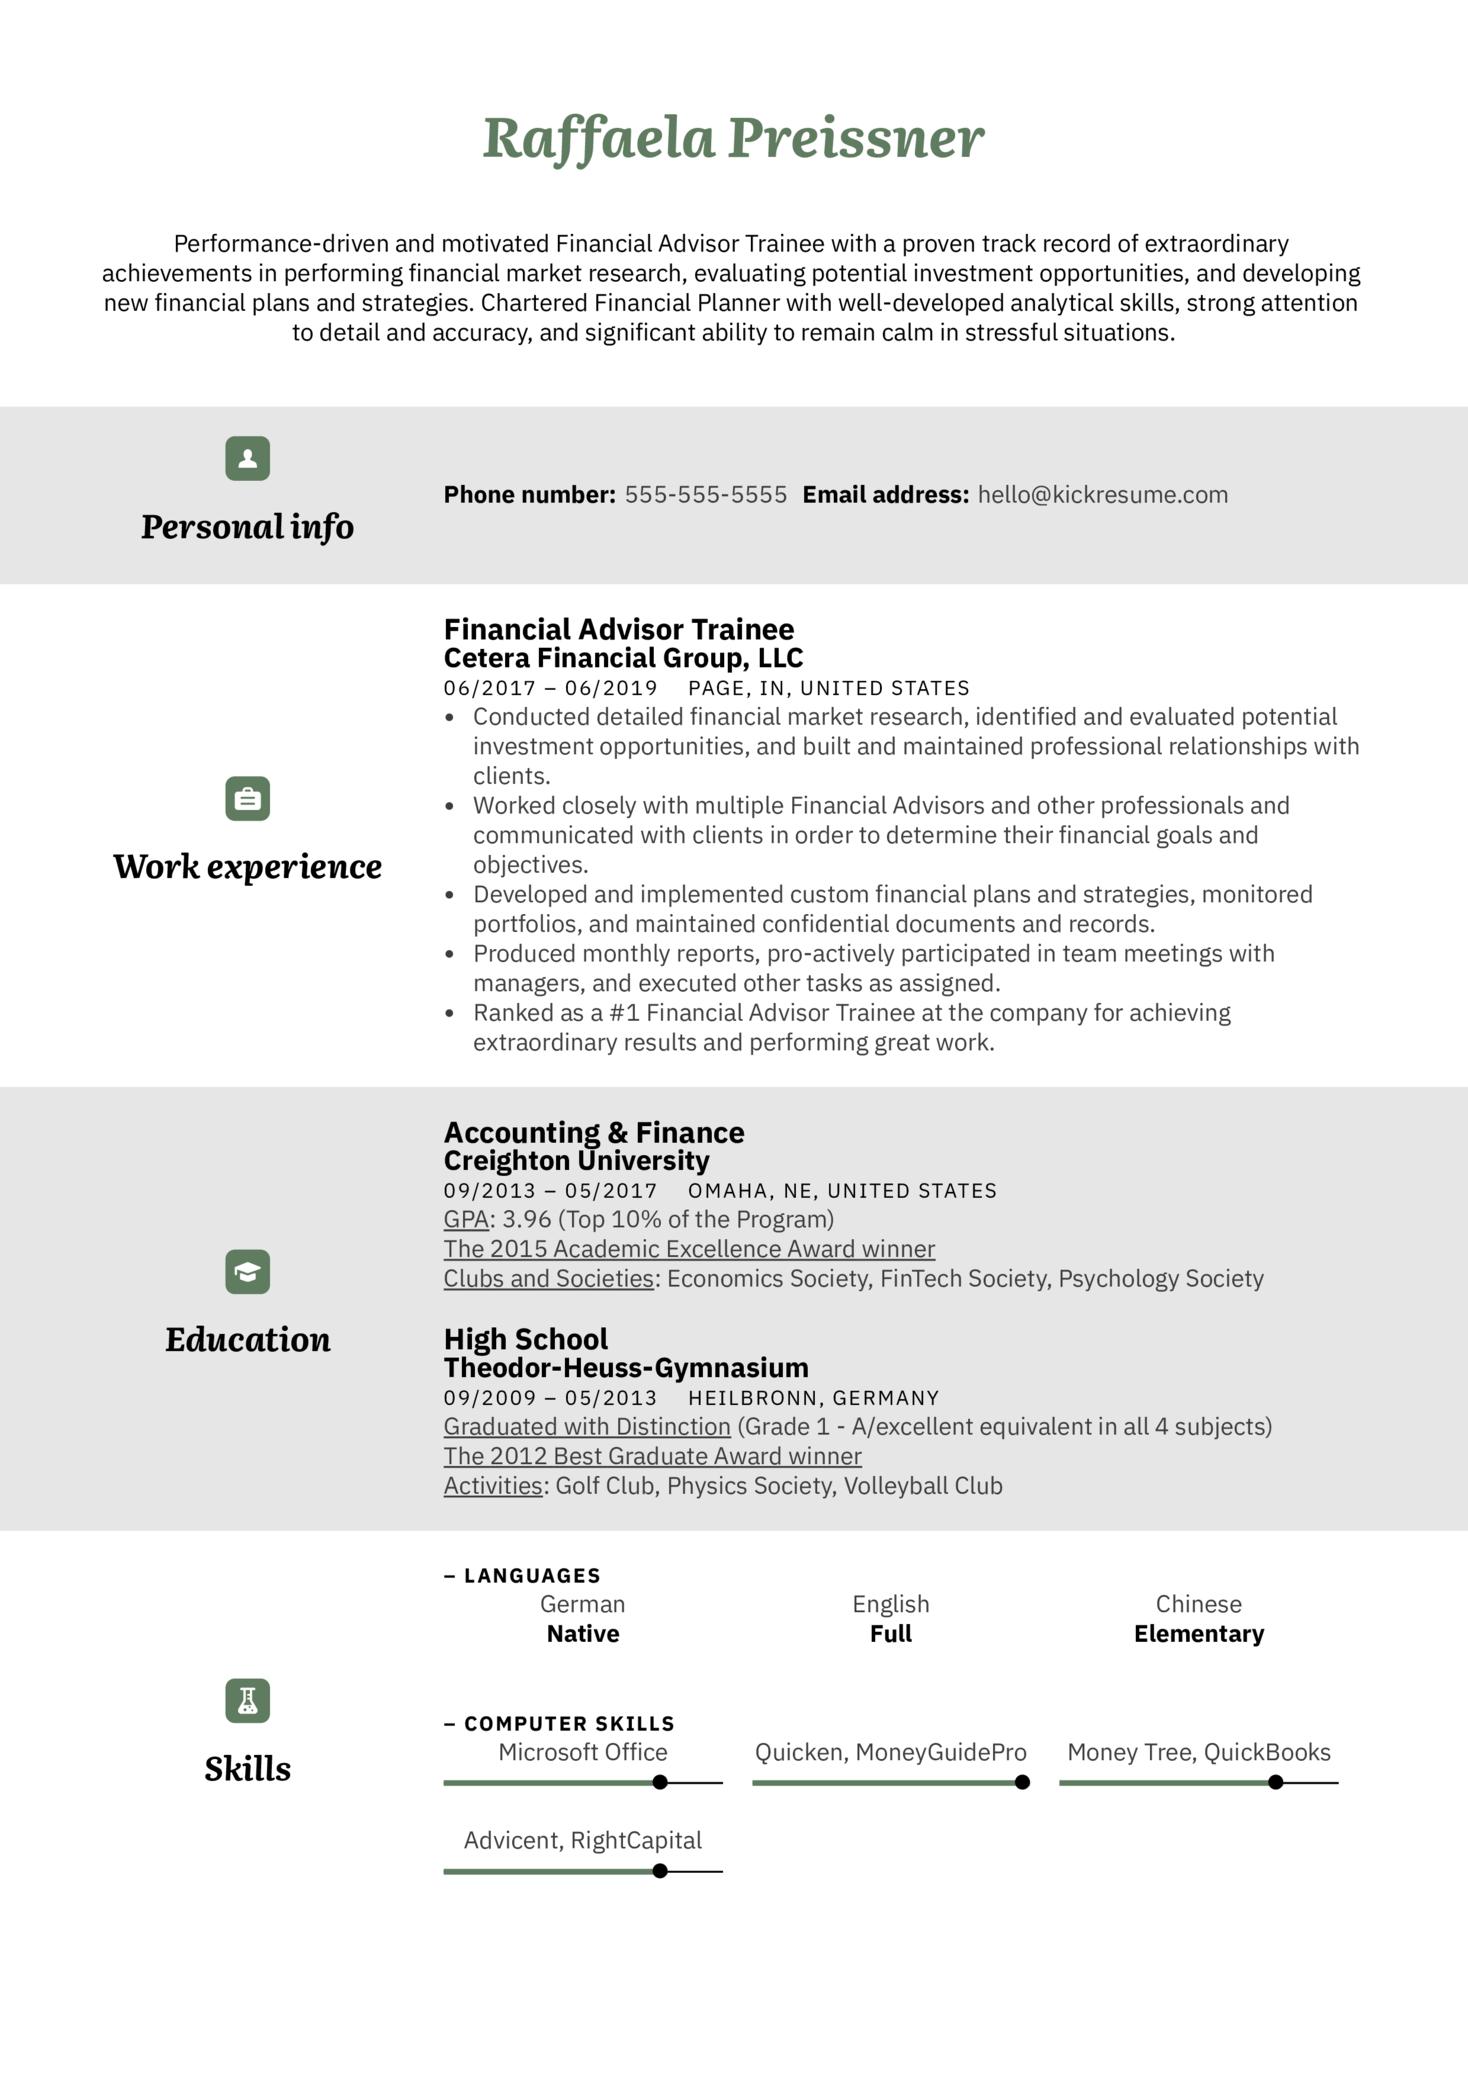 Financial Advisor Trainee Resume Example (parte 1)